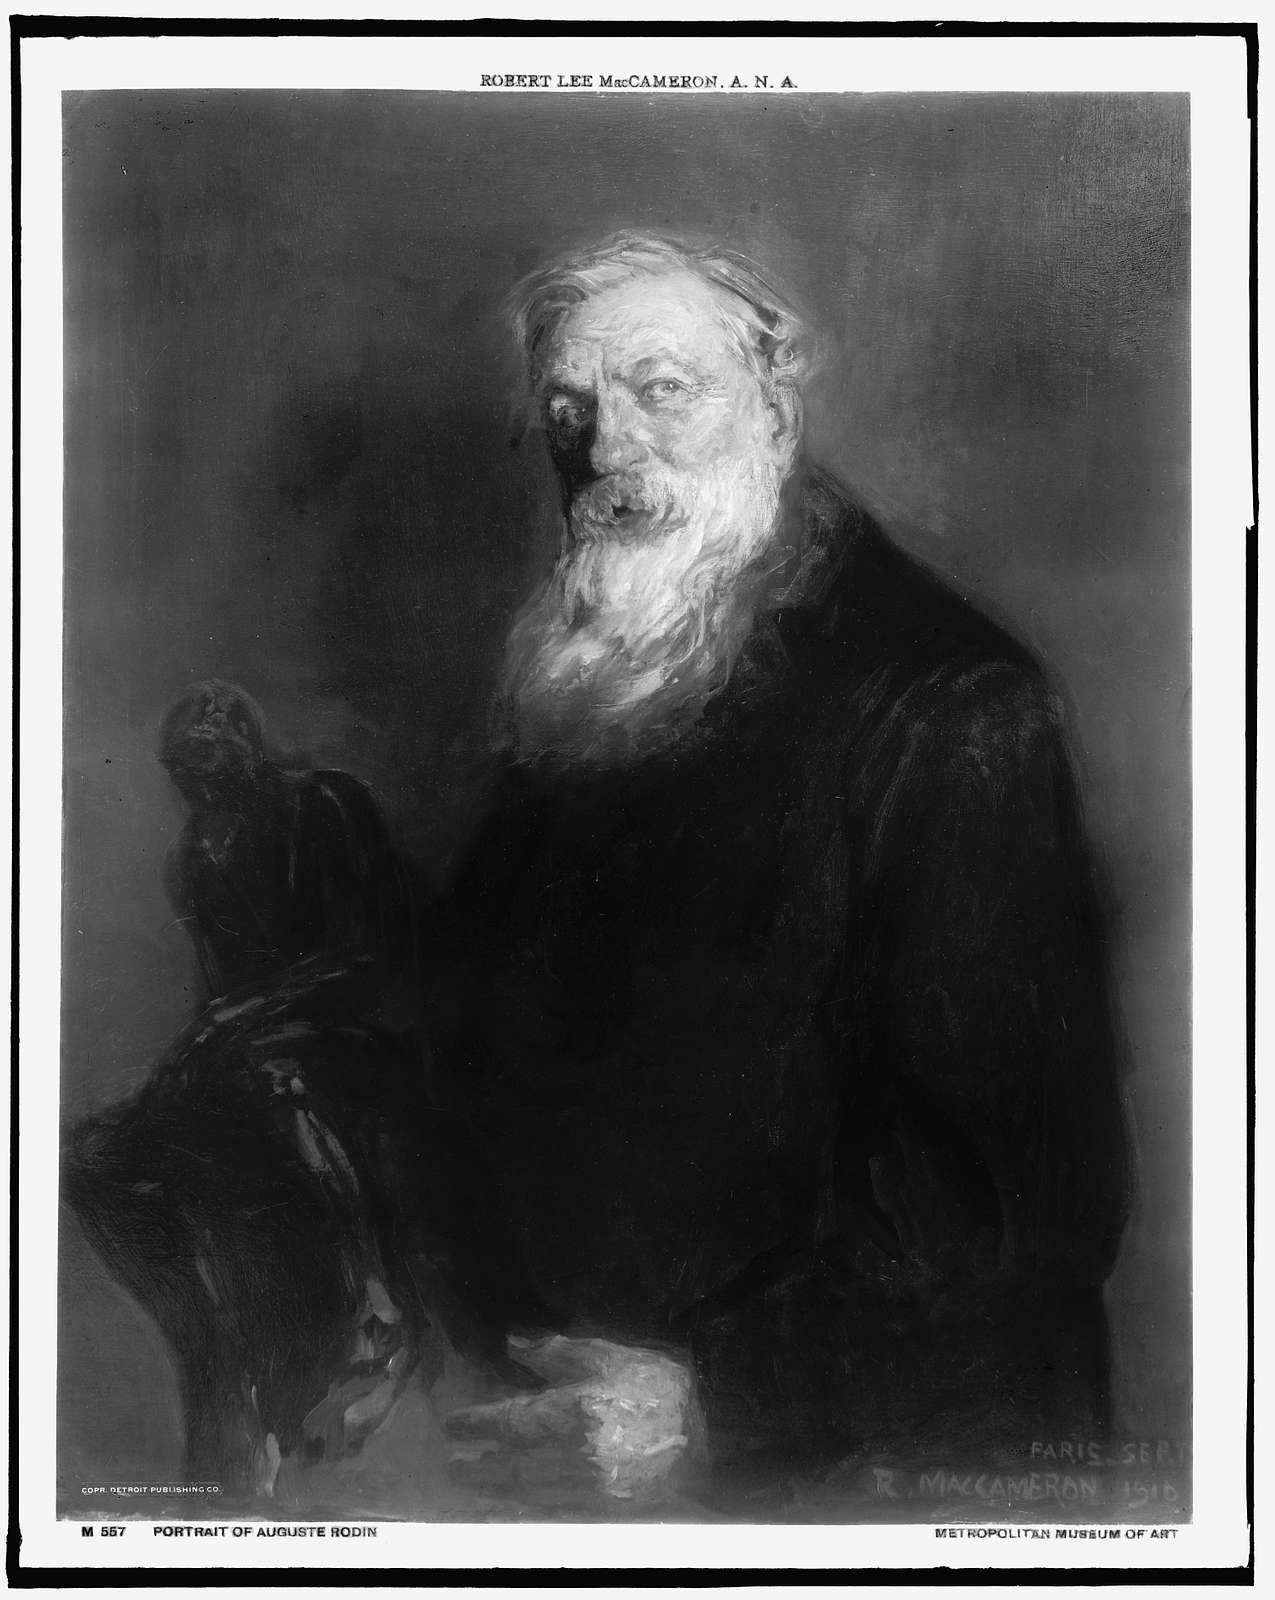 Auguste Rodin, half-length portrait